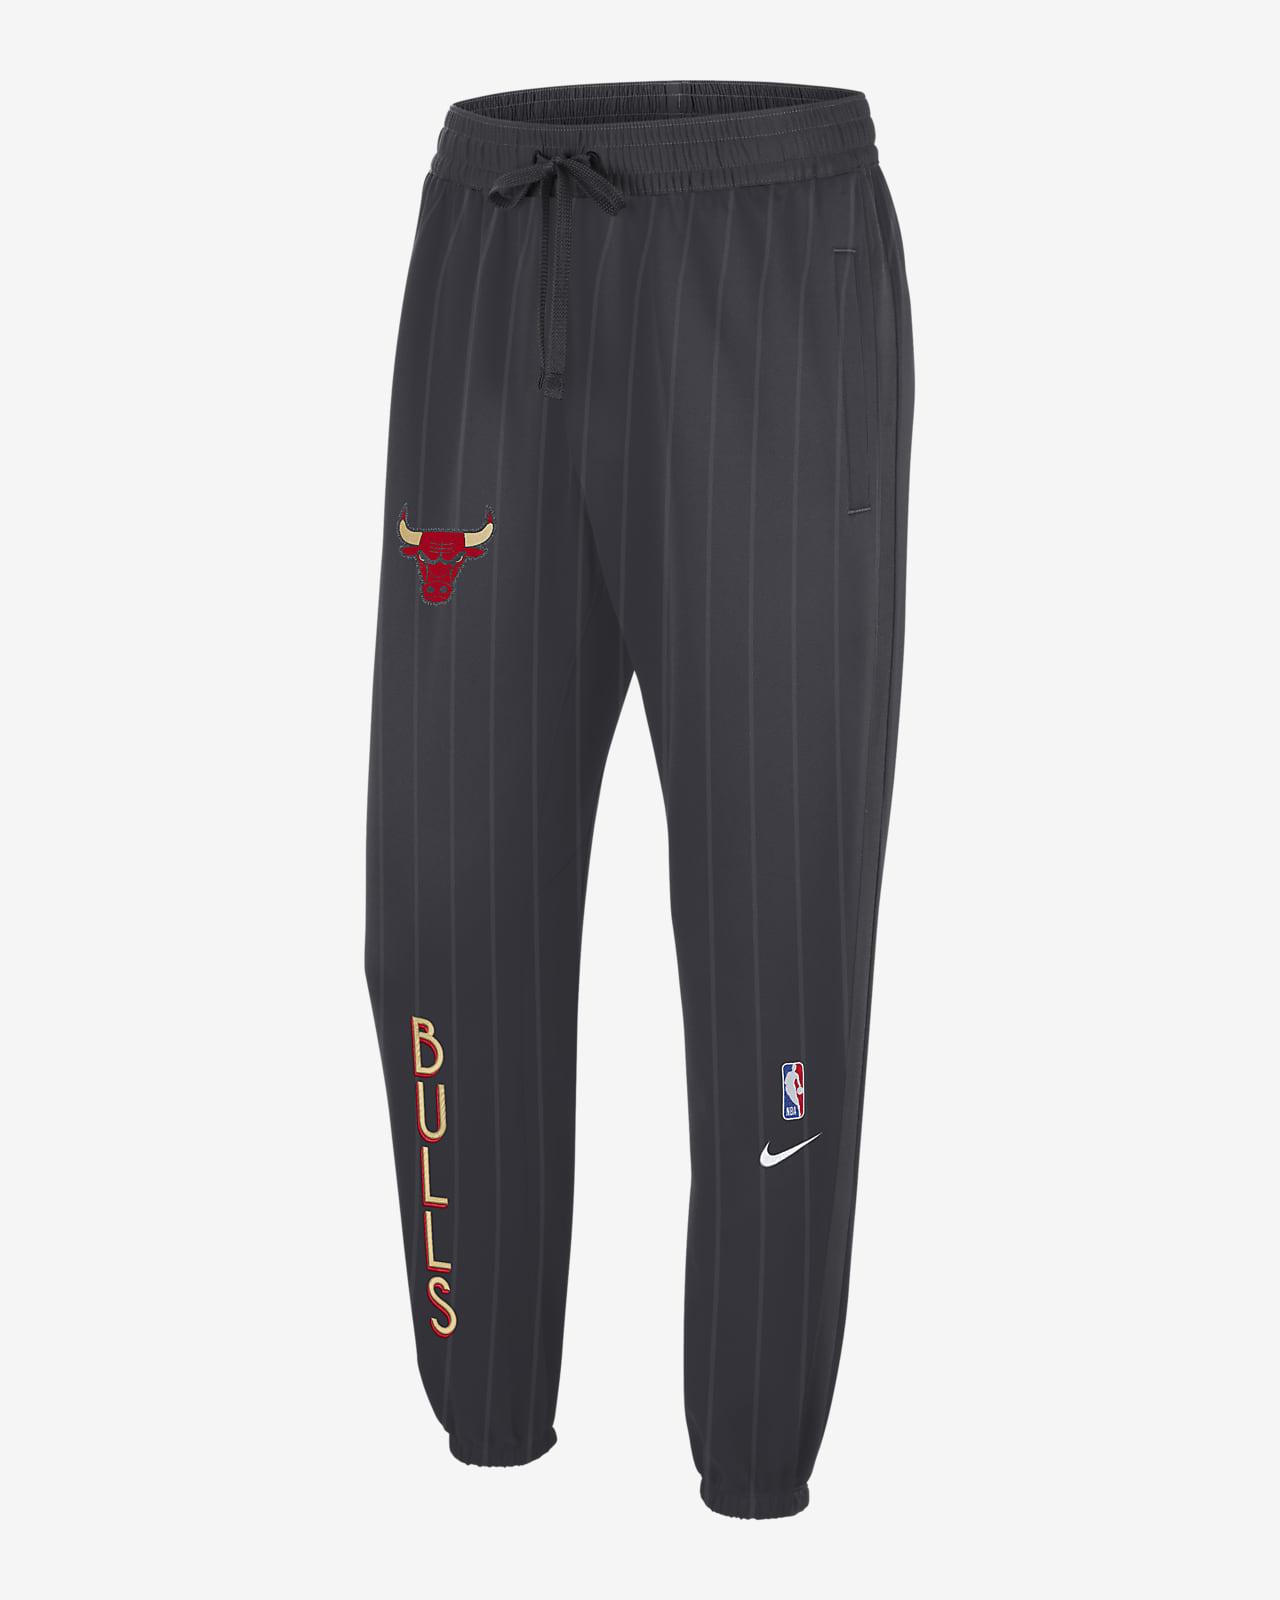 Pantalon Nike Therma Flex NBA Chicago Bulls Showtime City Edition pour Homme